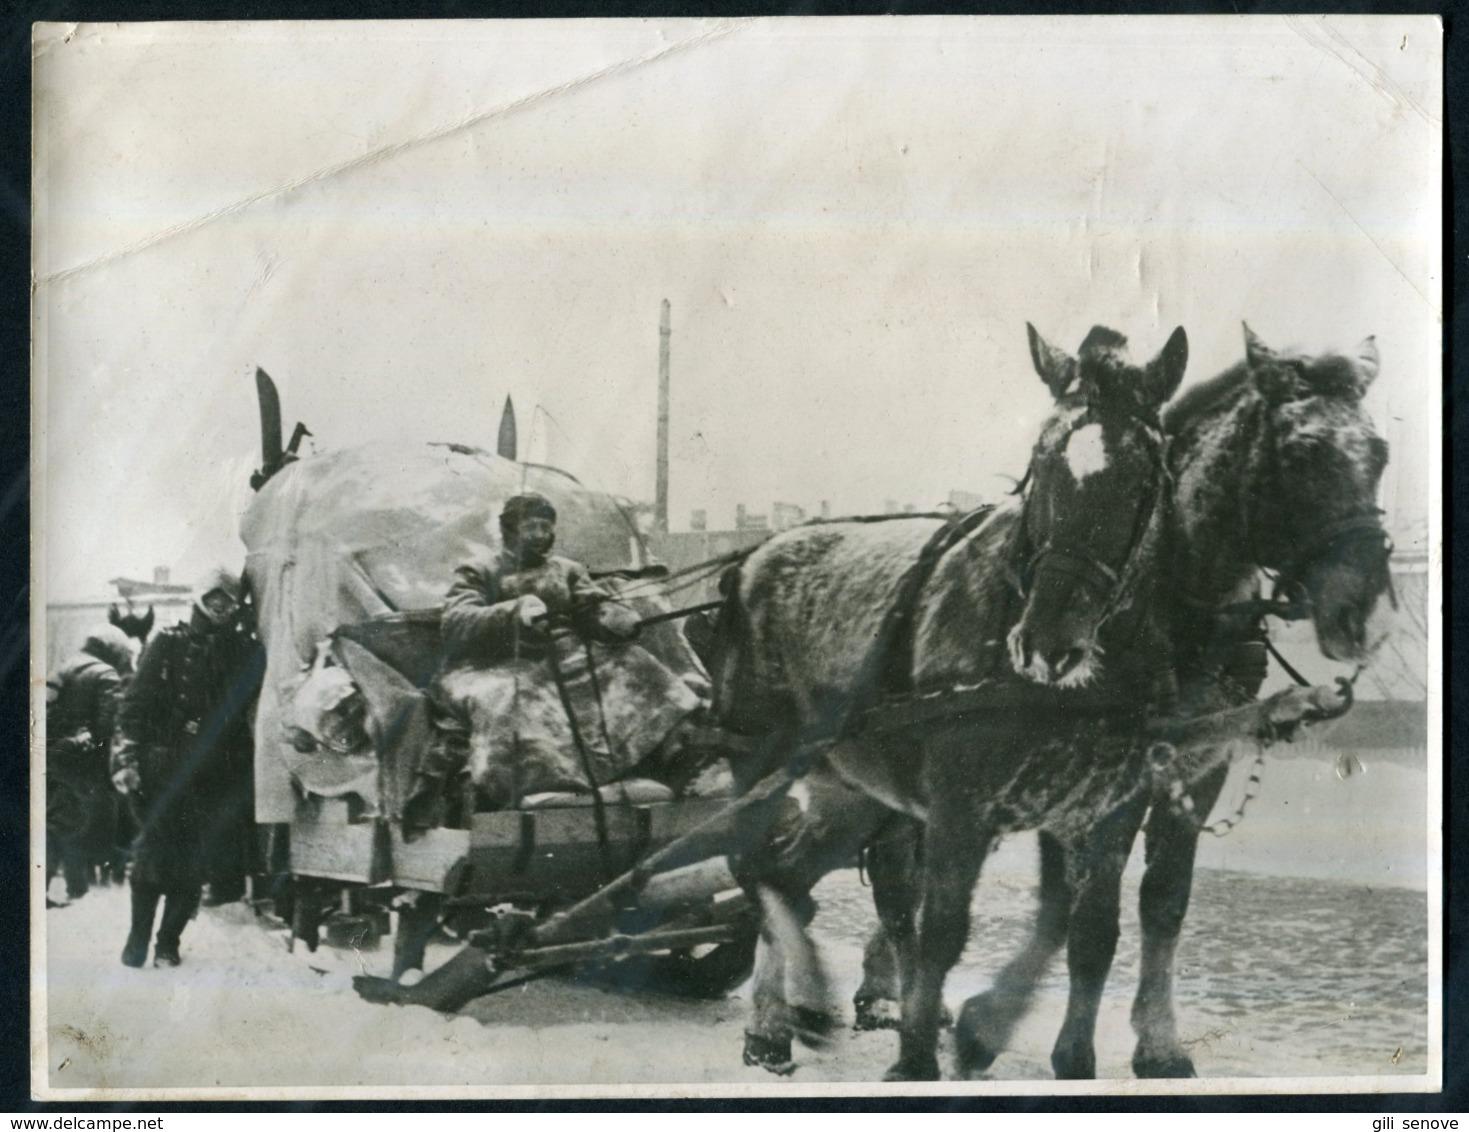 1942 WWII German War Photo / German Army In Winter - 1939-45